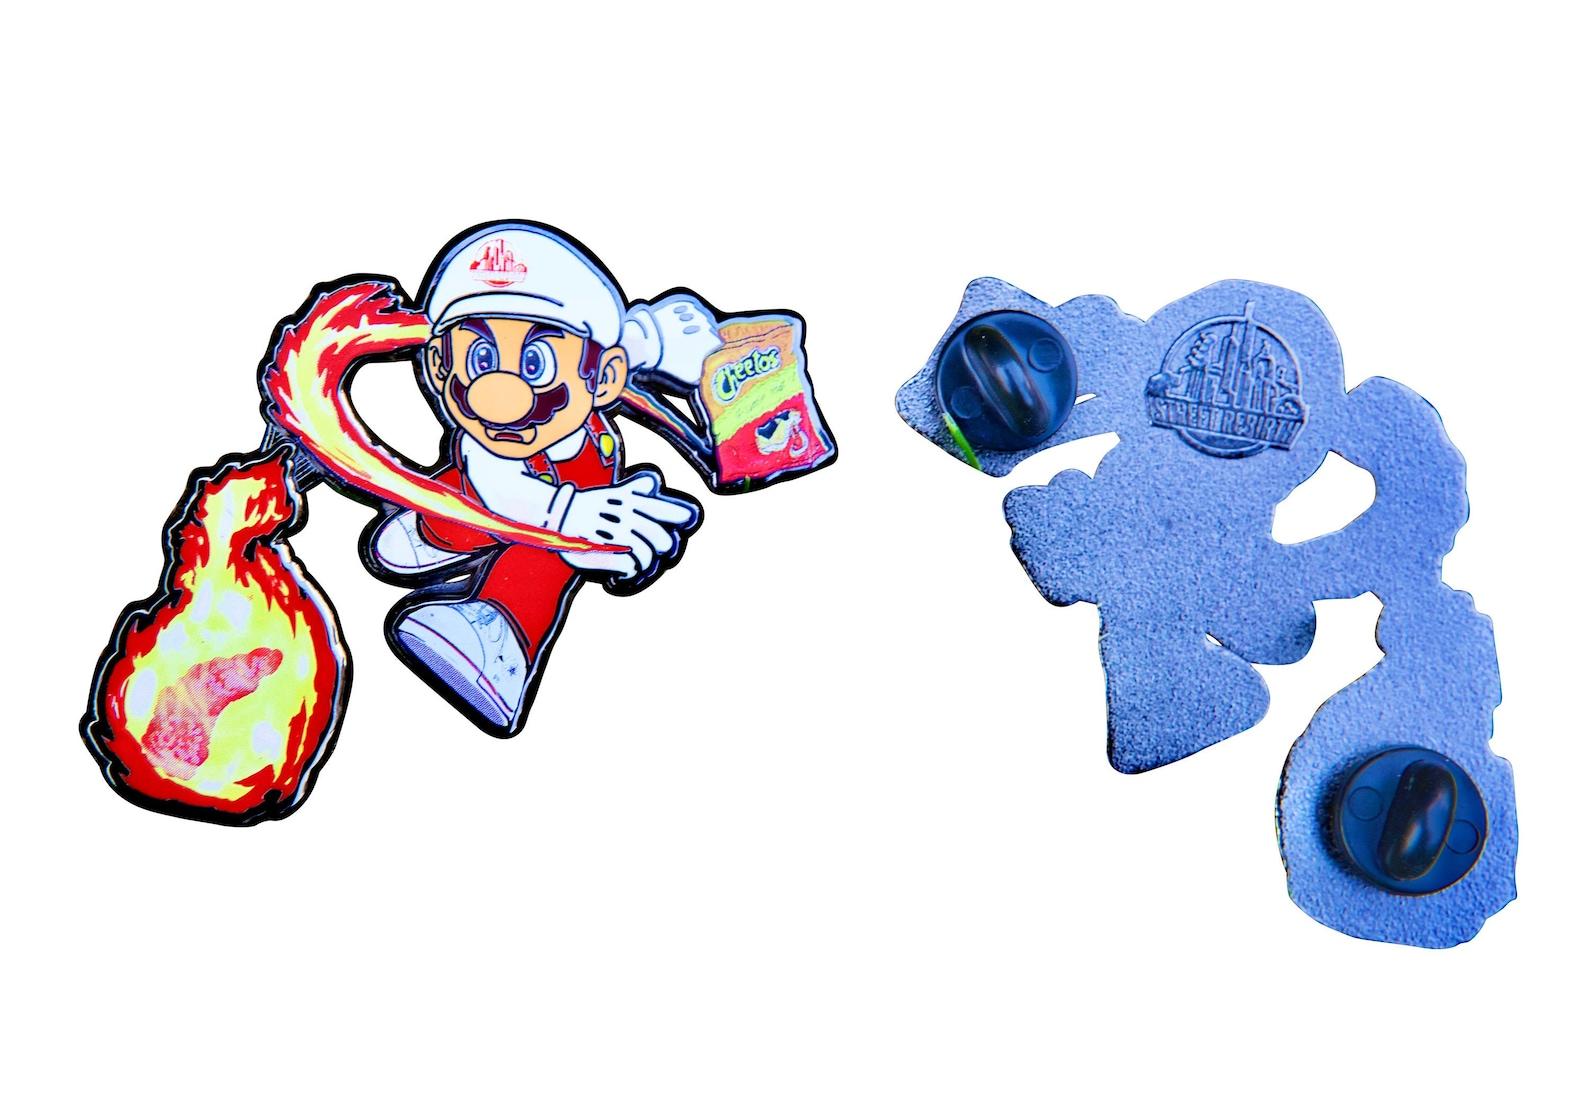 Amazon.com: Mario Hot Chips Throw Enamel Pin - 2 Inch Zinc